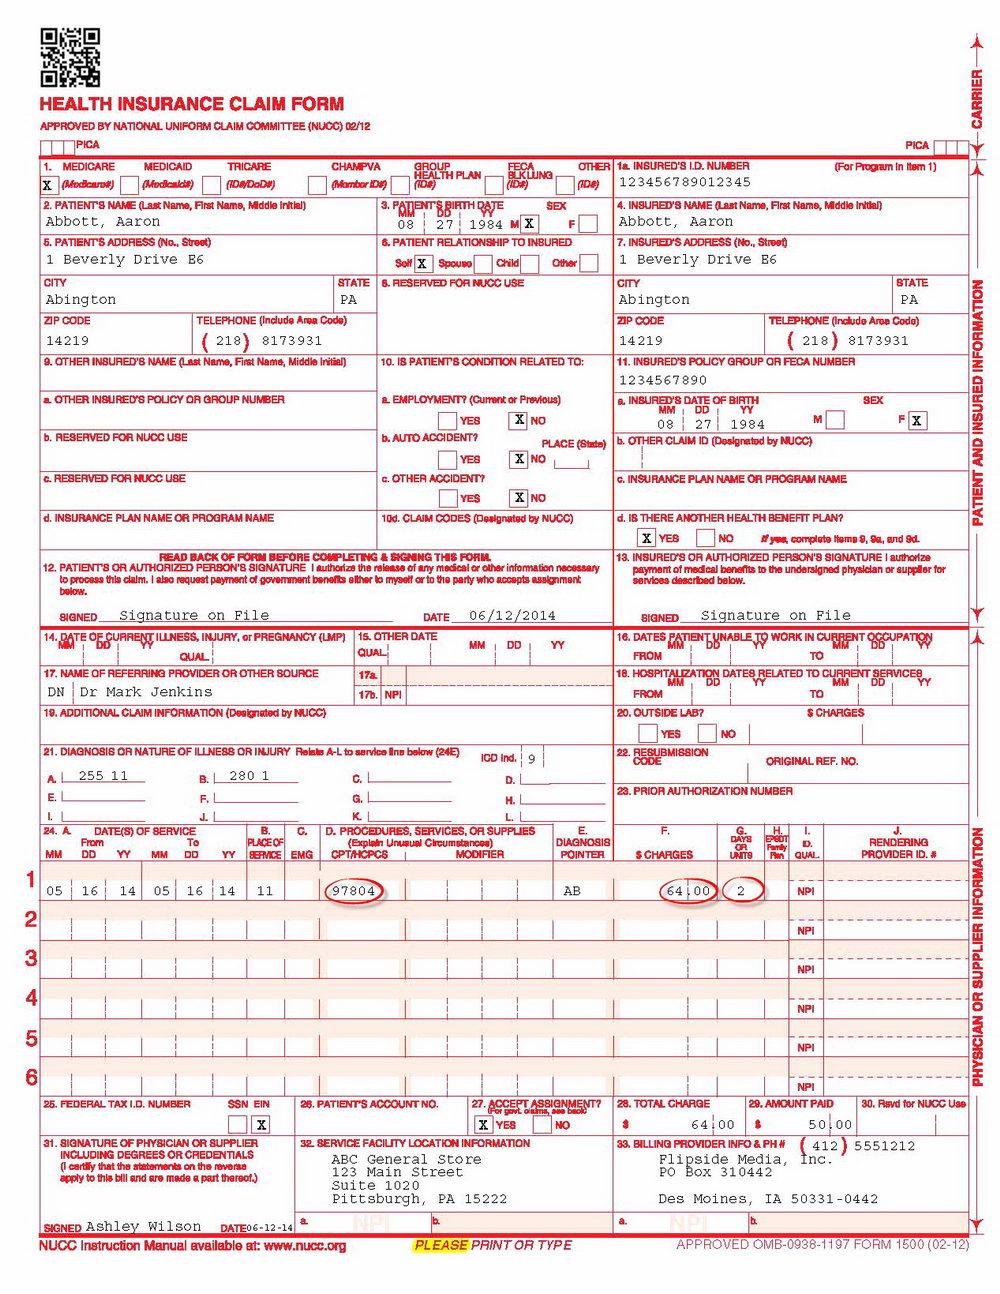 Cms 1500 Form Download